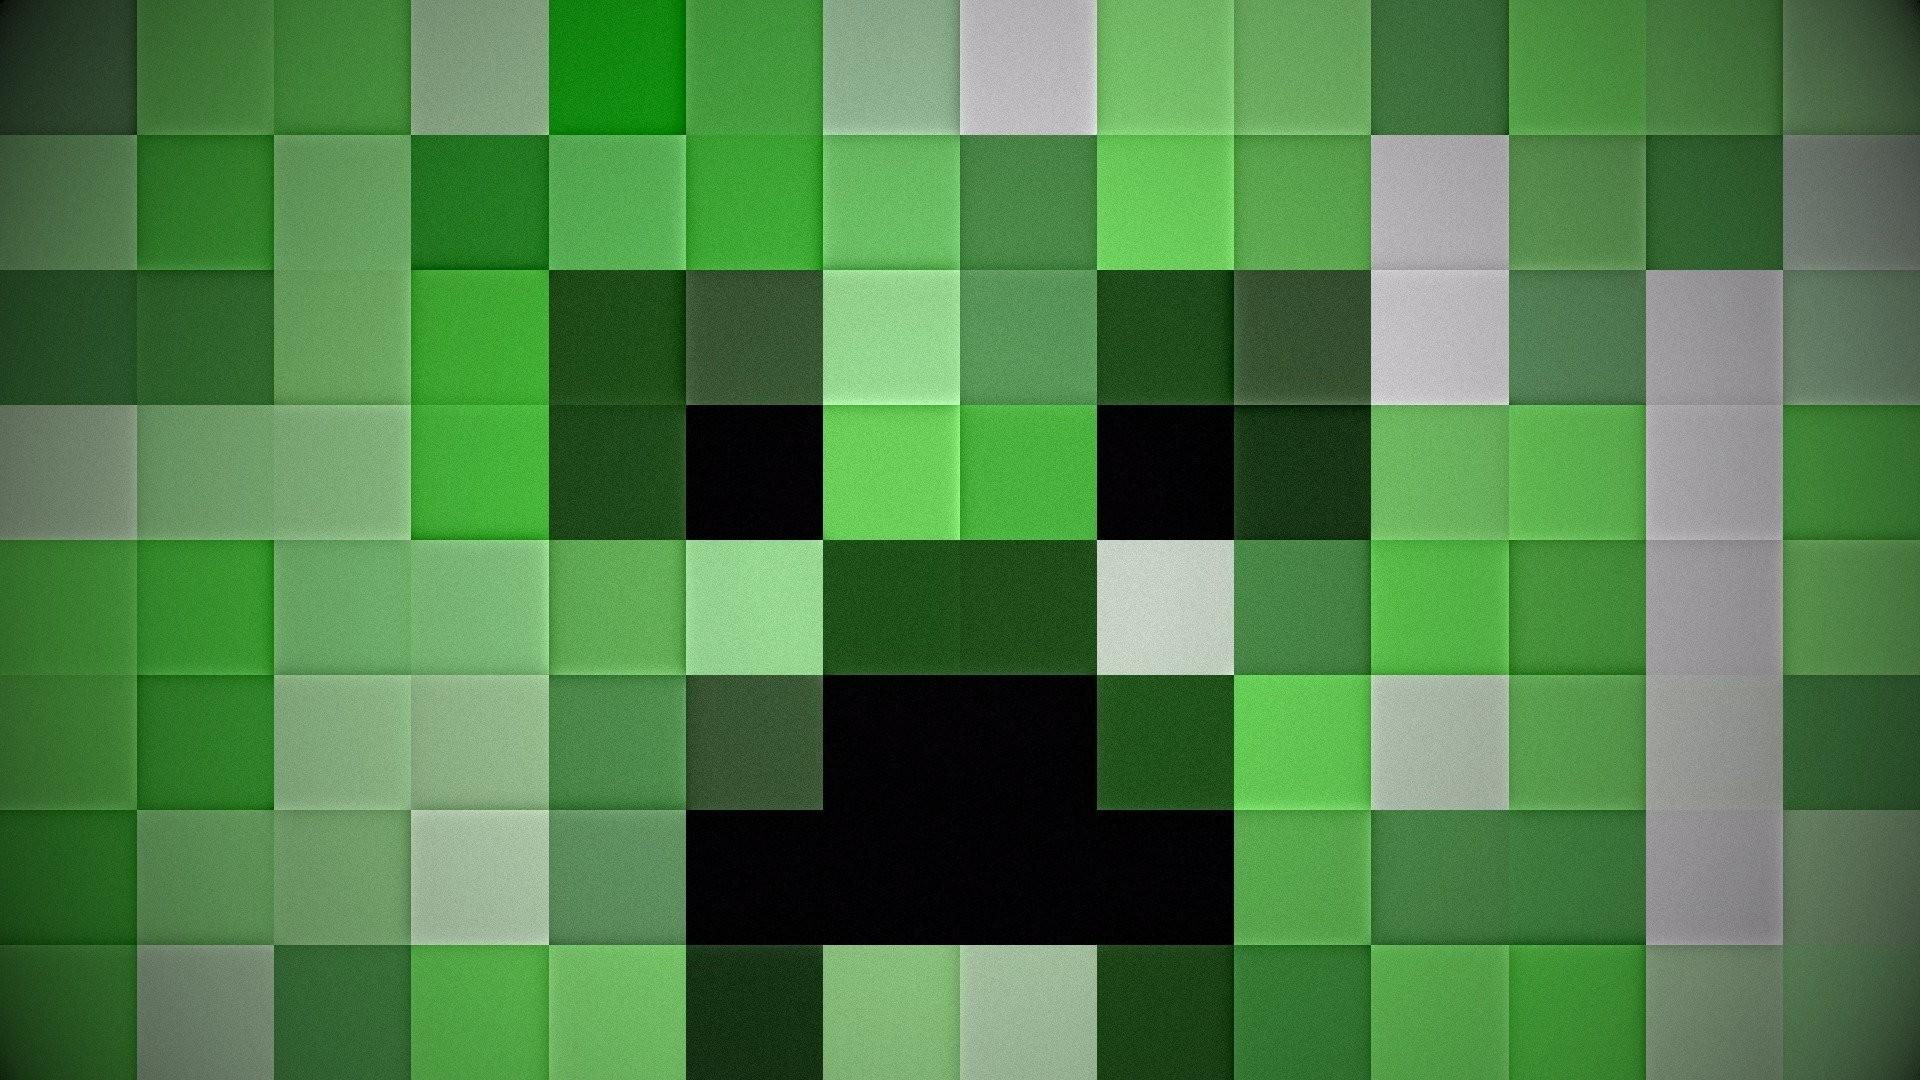 2560x1440 Wallpaperwiki Minecraft Creeper Iphone Image PIC